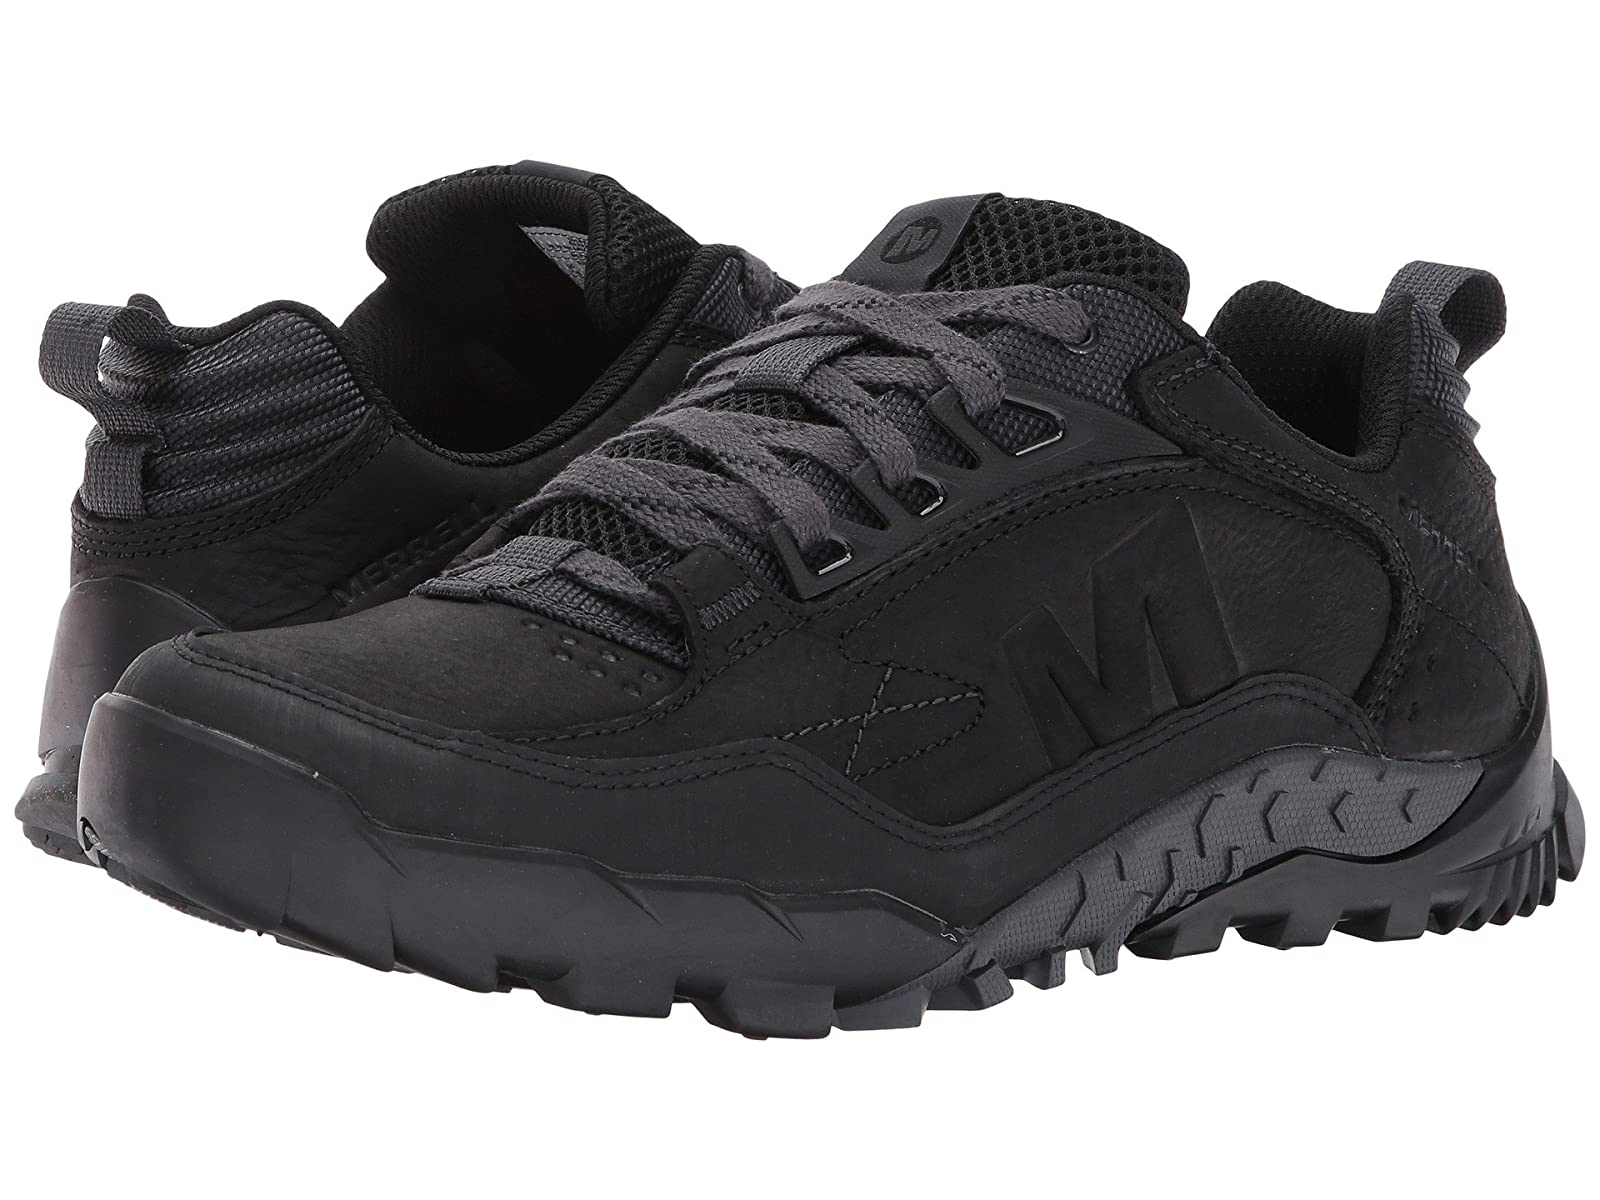 Merrell Annex Trak LowAtmospheric grades have affordable shoes